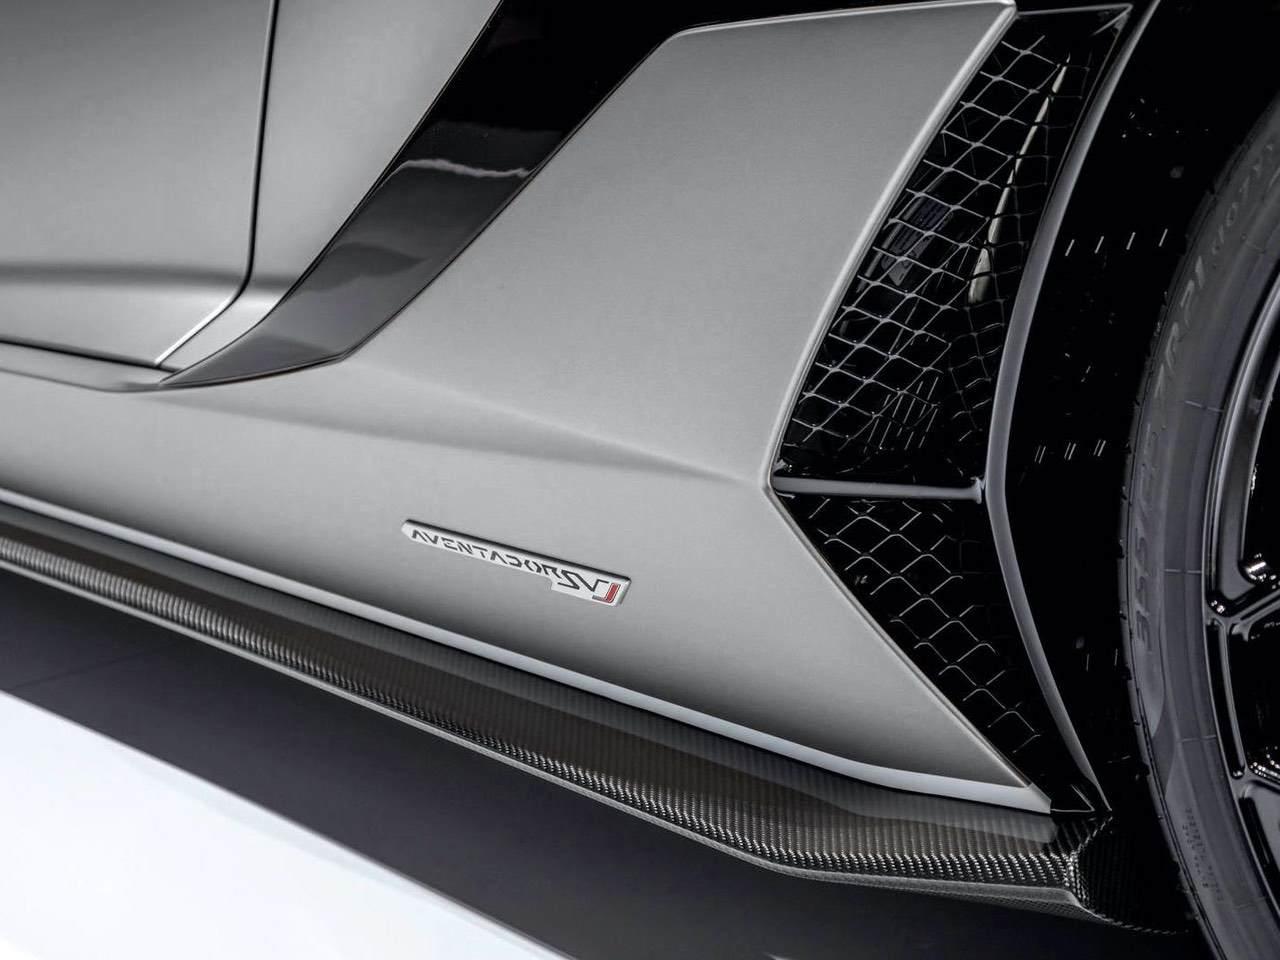 Lamborghini-Aventador-SVJ-Roadster-Grey-10